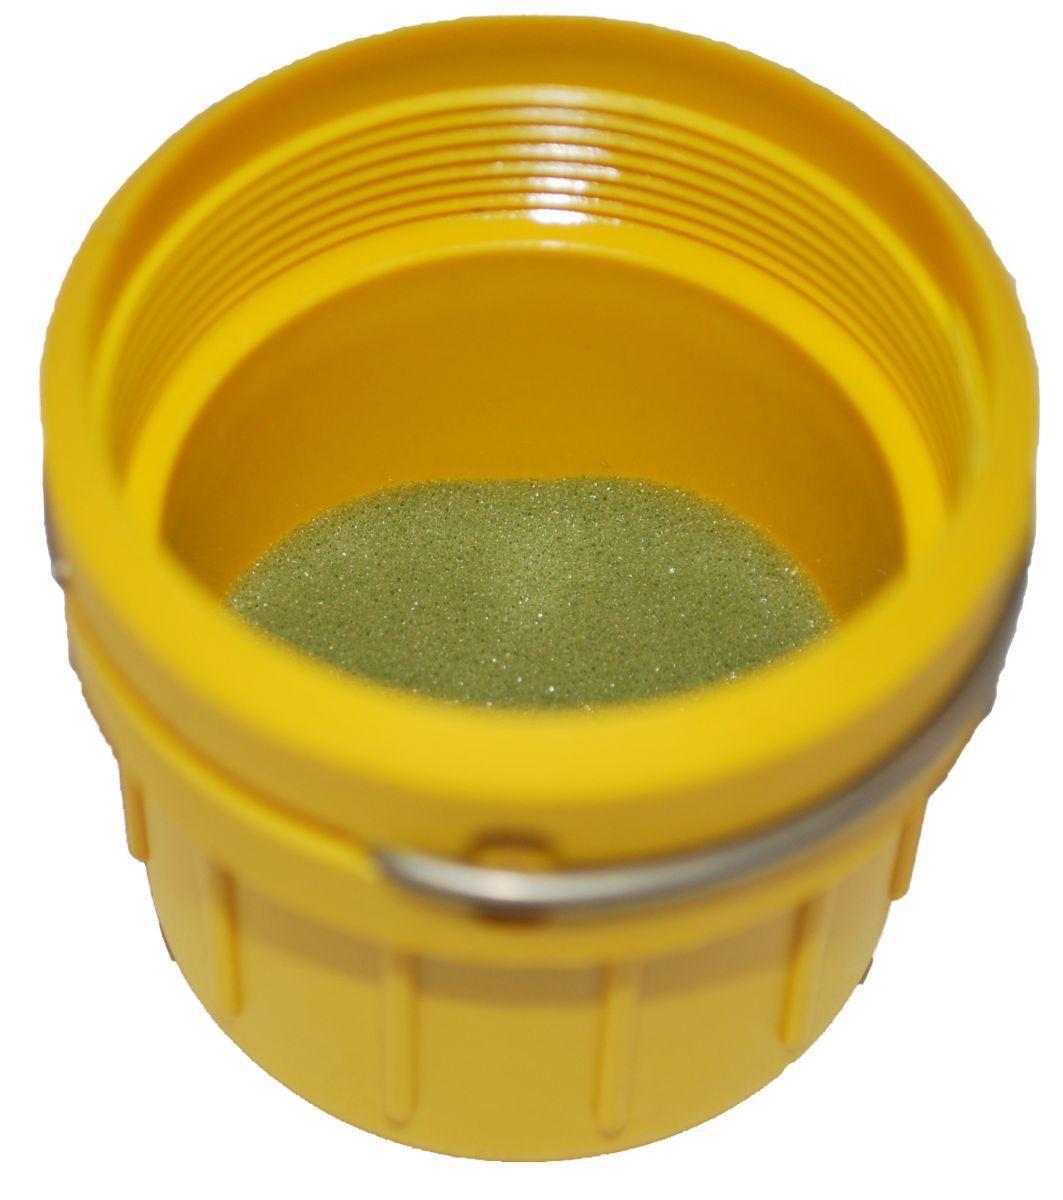 von arx npmh23k set of yellow plastic cap